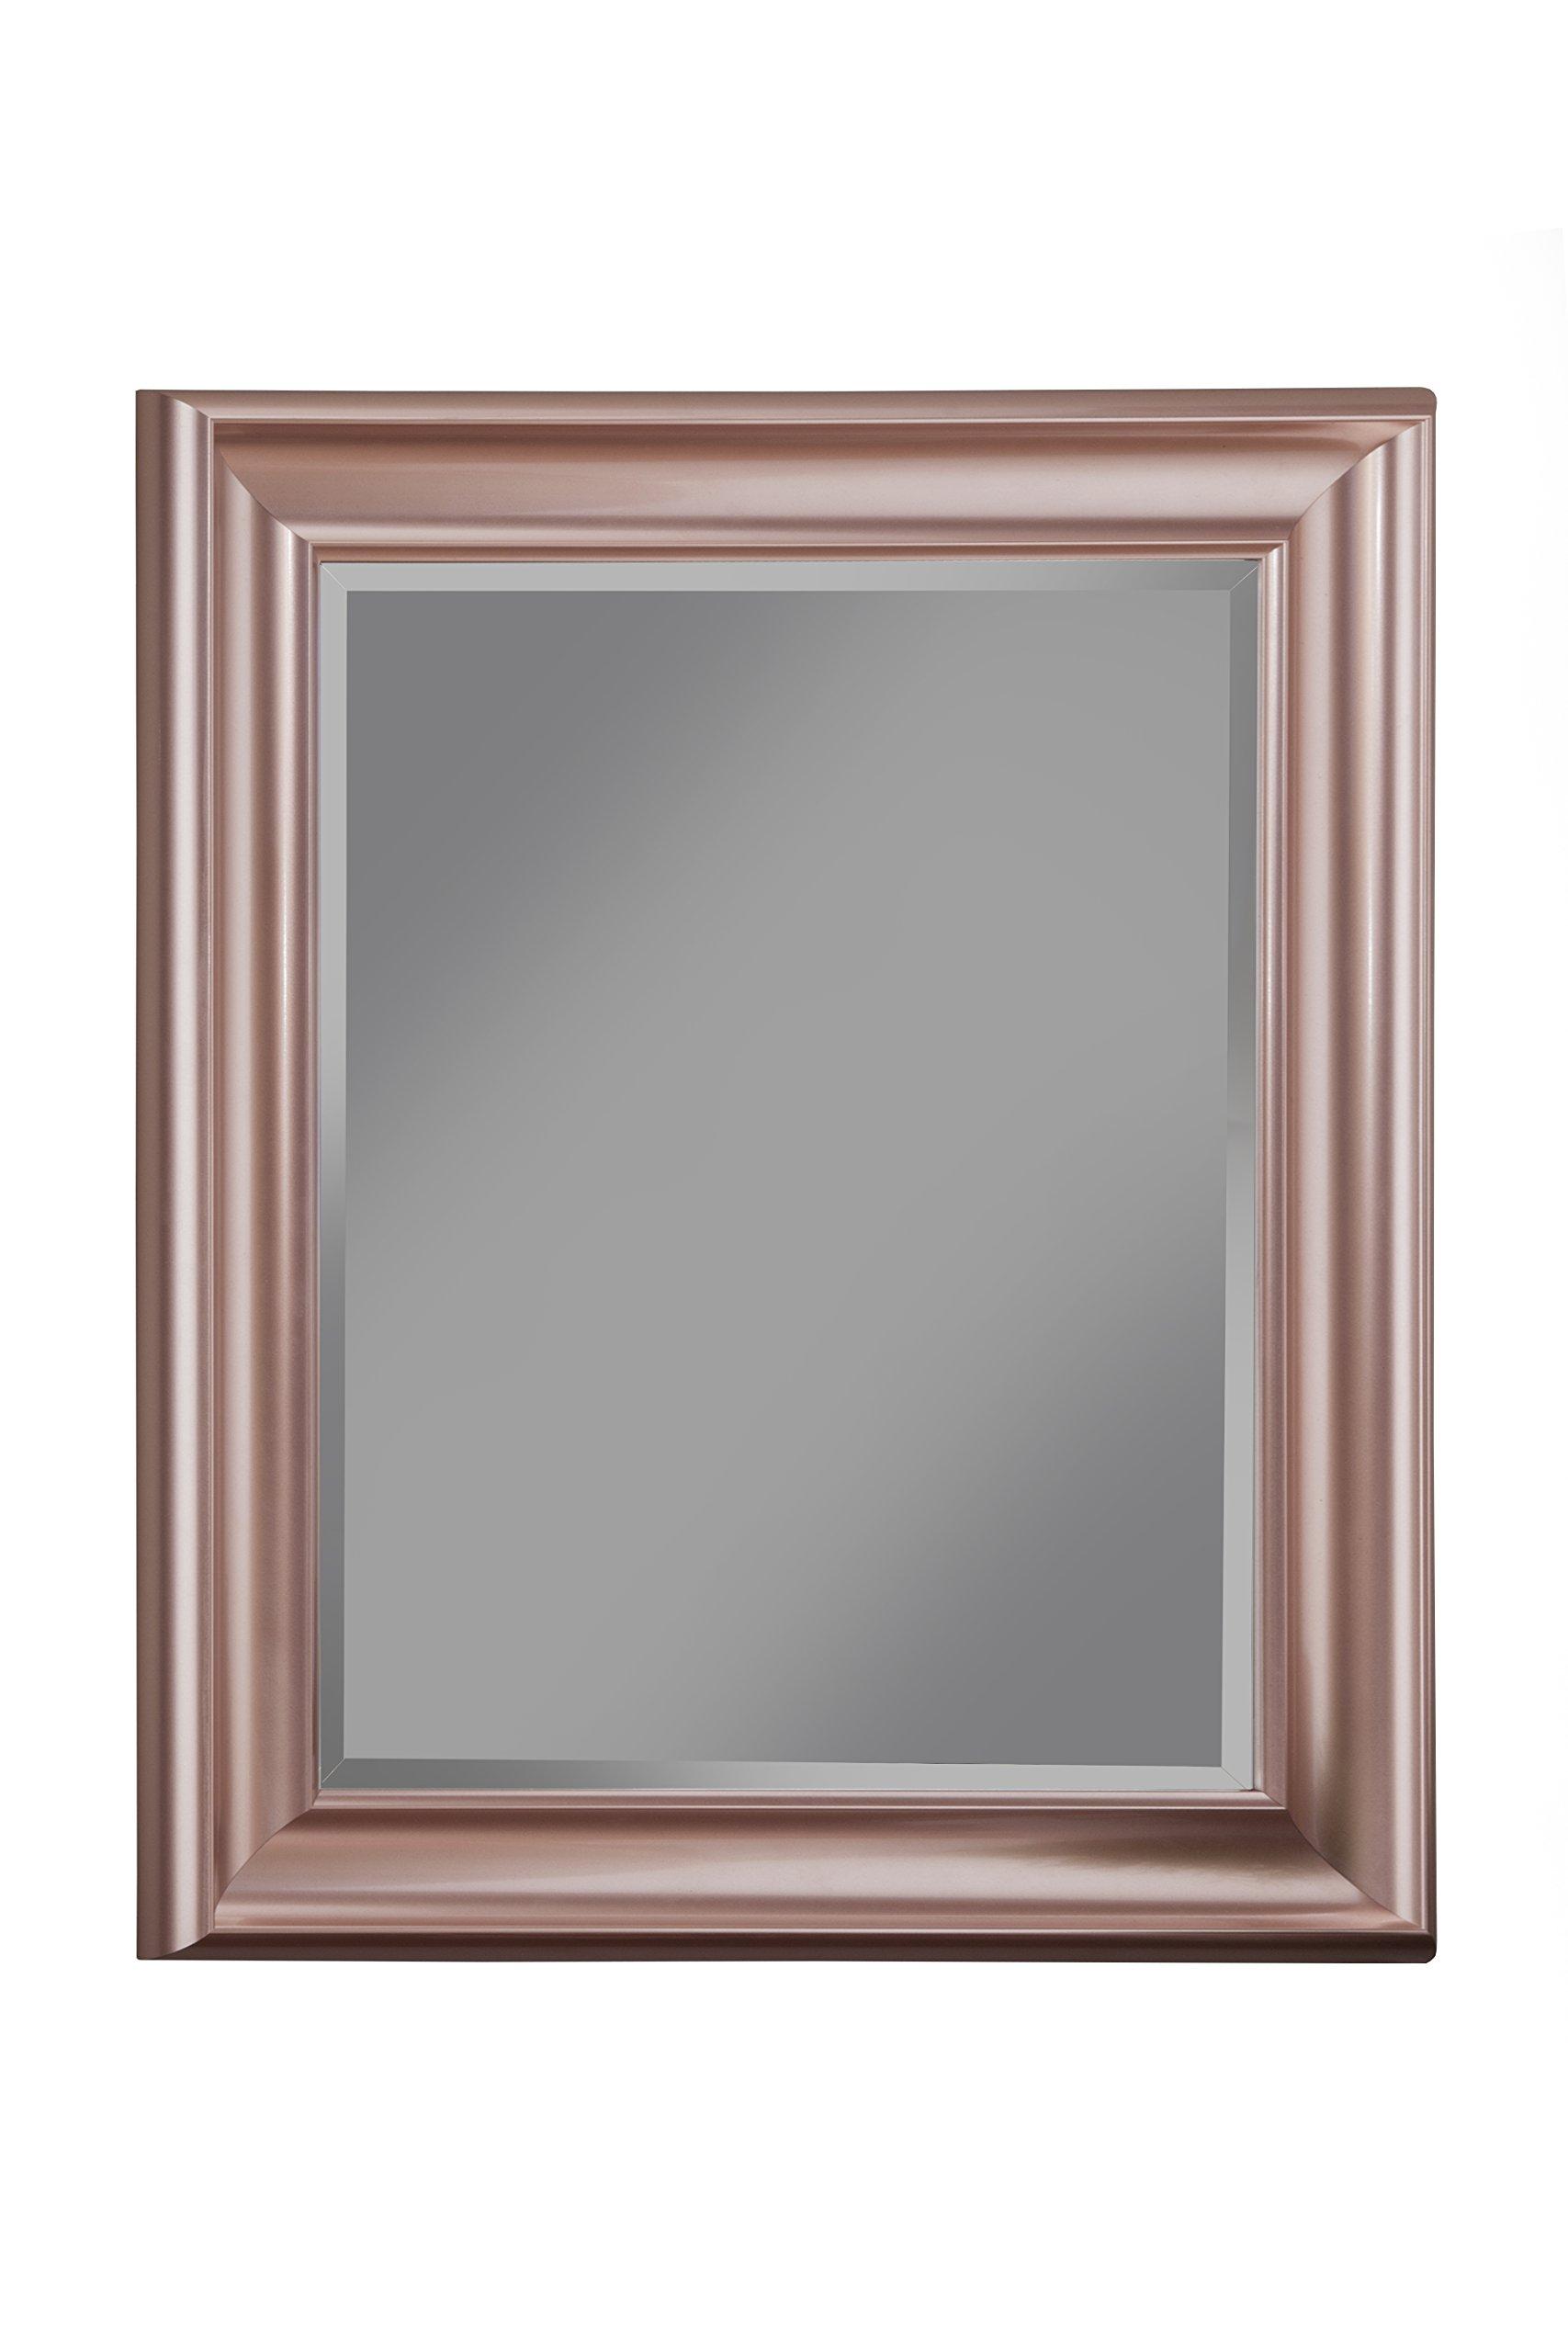 Sandberg Furniture Rose Gold Wall Mirror, 36'' x 30''